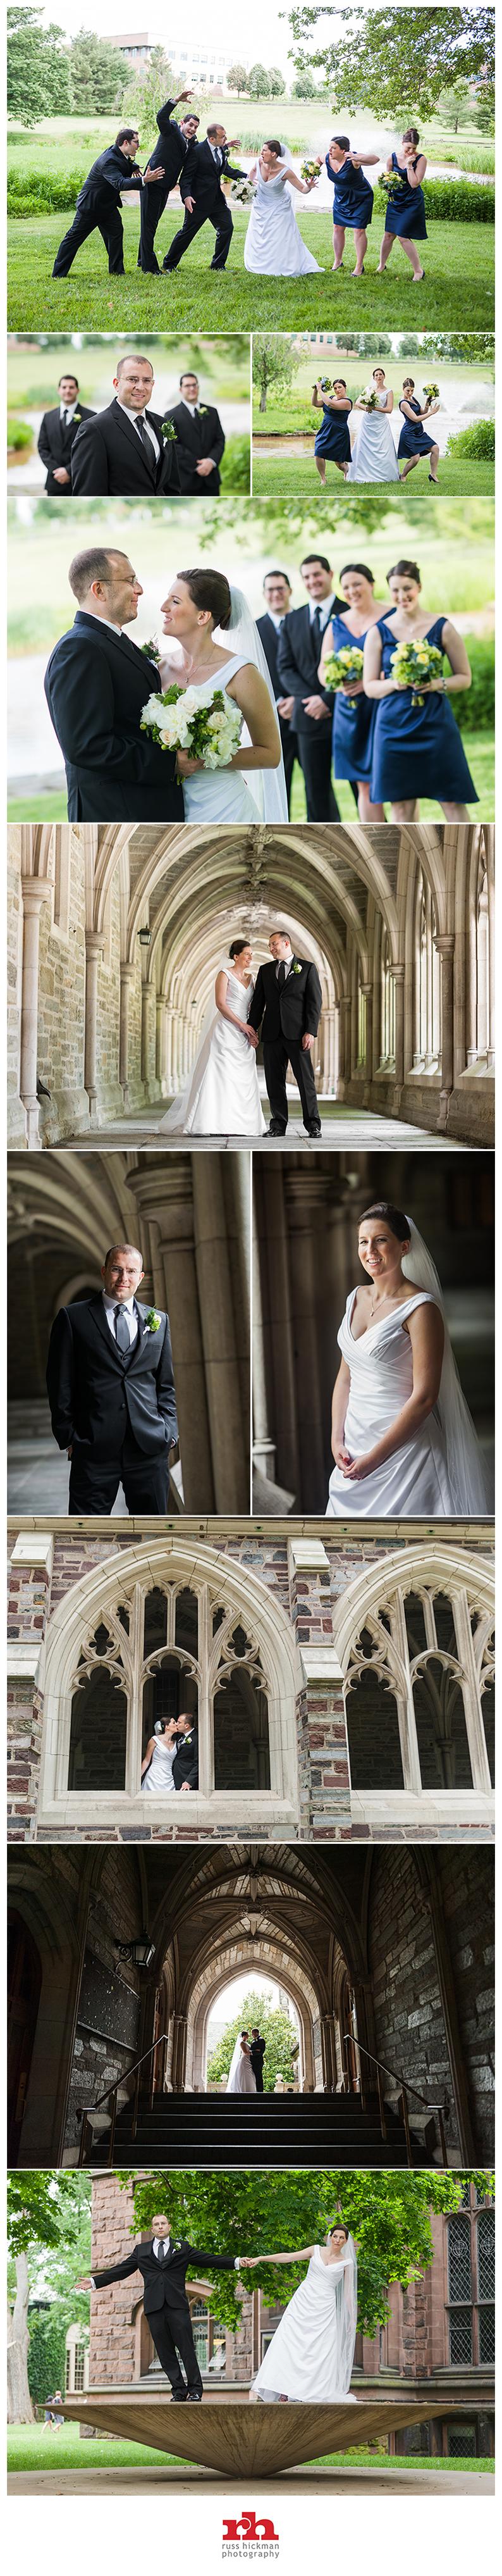 Philadelphia Wedding Photographer MZWB0004